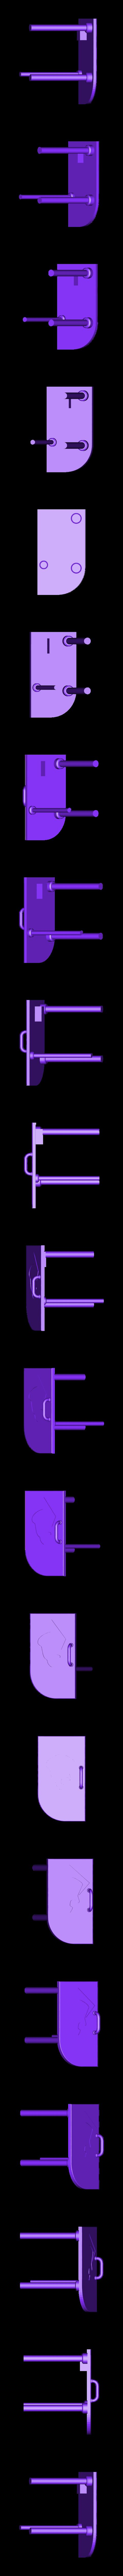 futureBear-turretD.stl Download free STL file Future Bear - M5A1 Ultra Evolution • 3D printing design, cycstudio